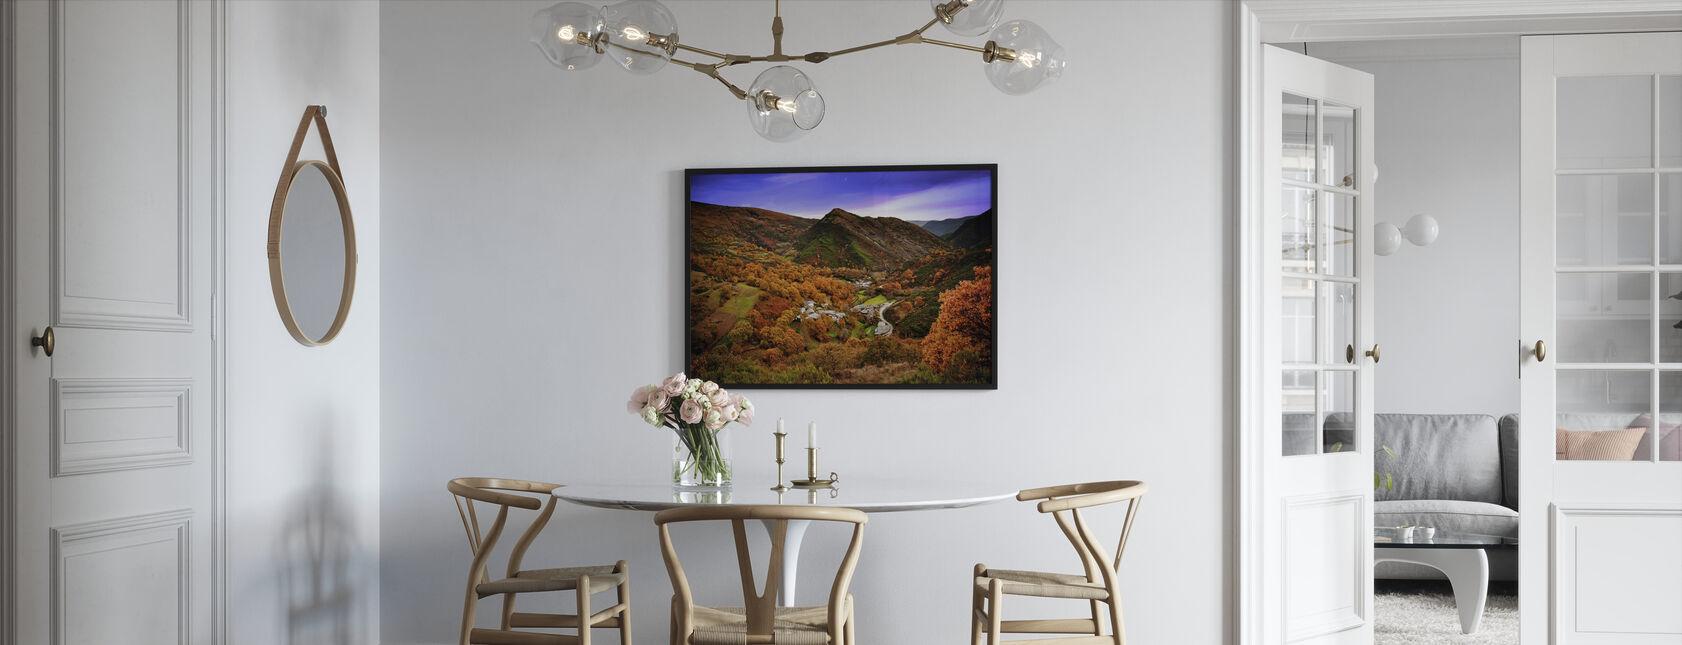 Great Autumn Scenery - Framed print - Kitchen